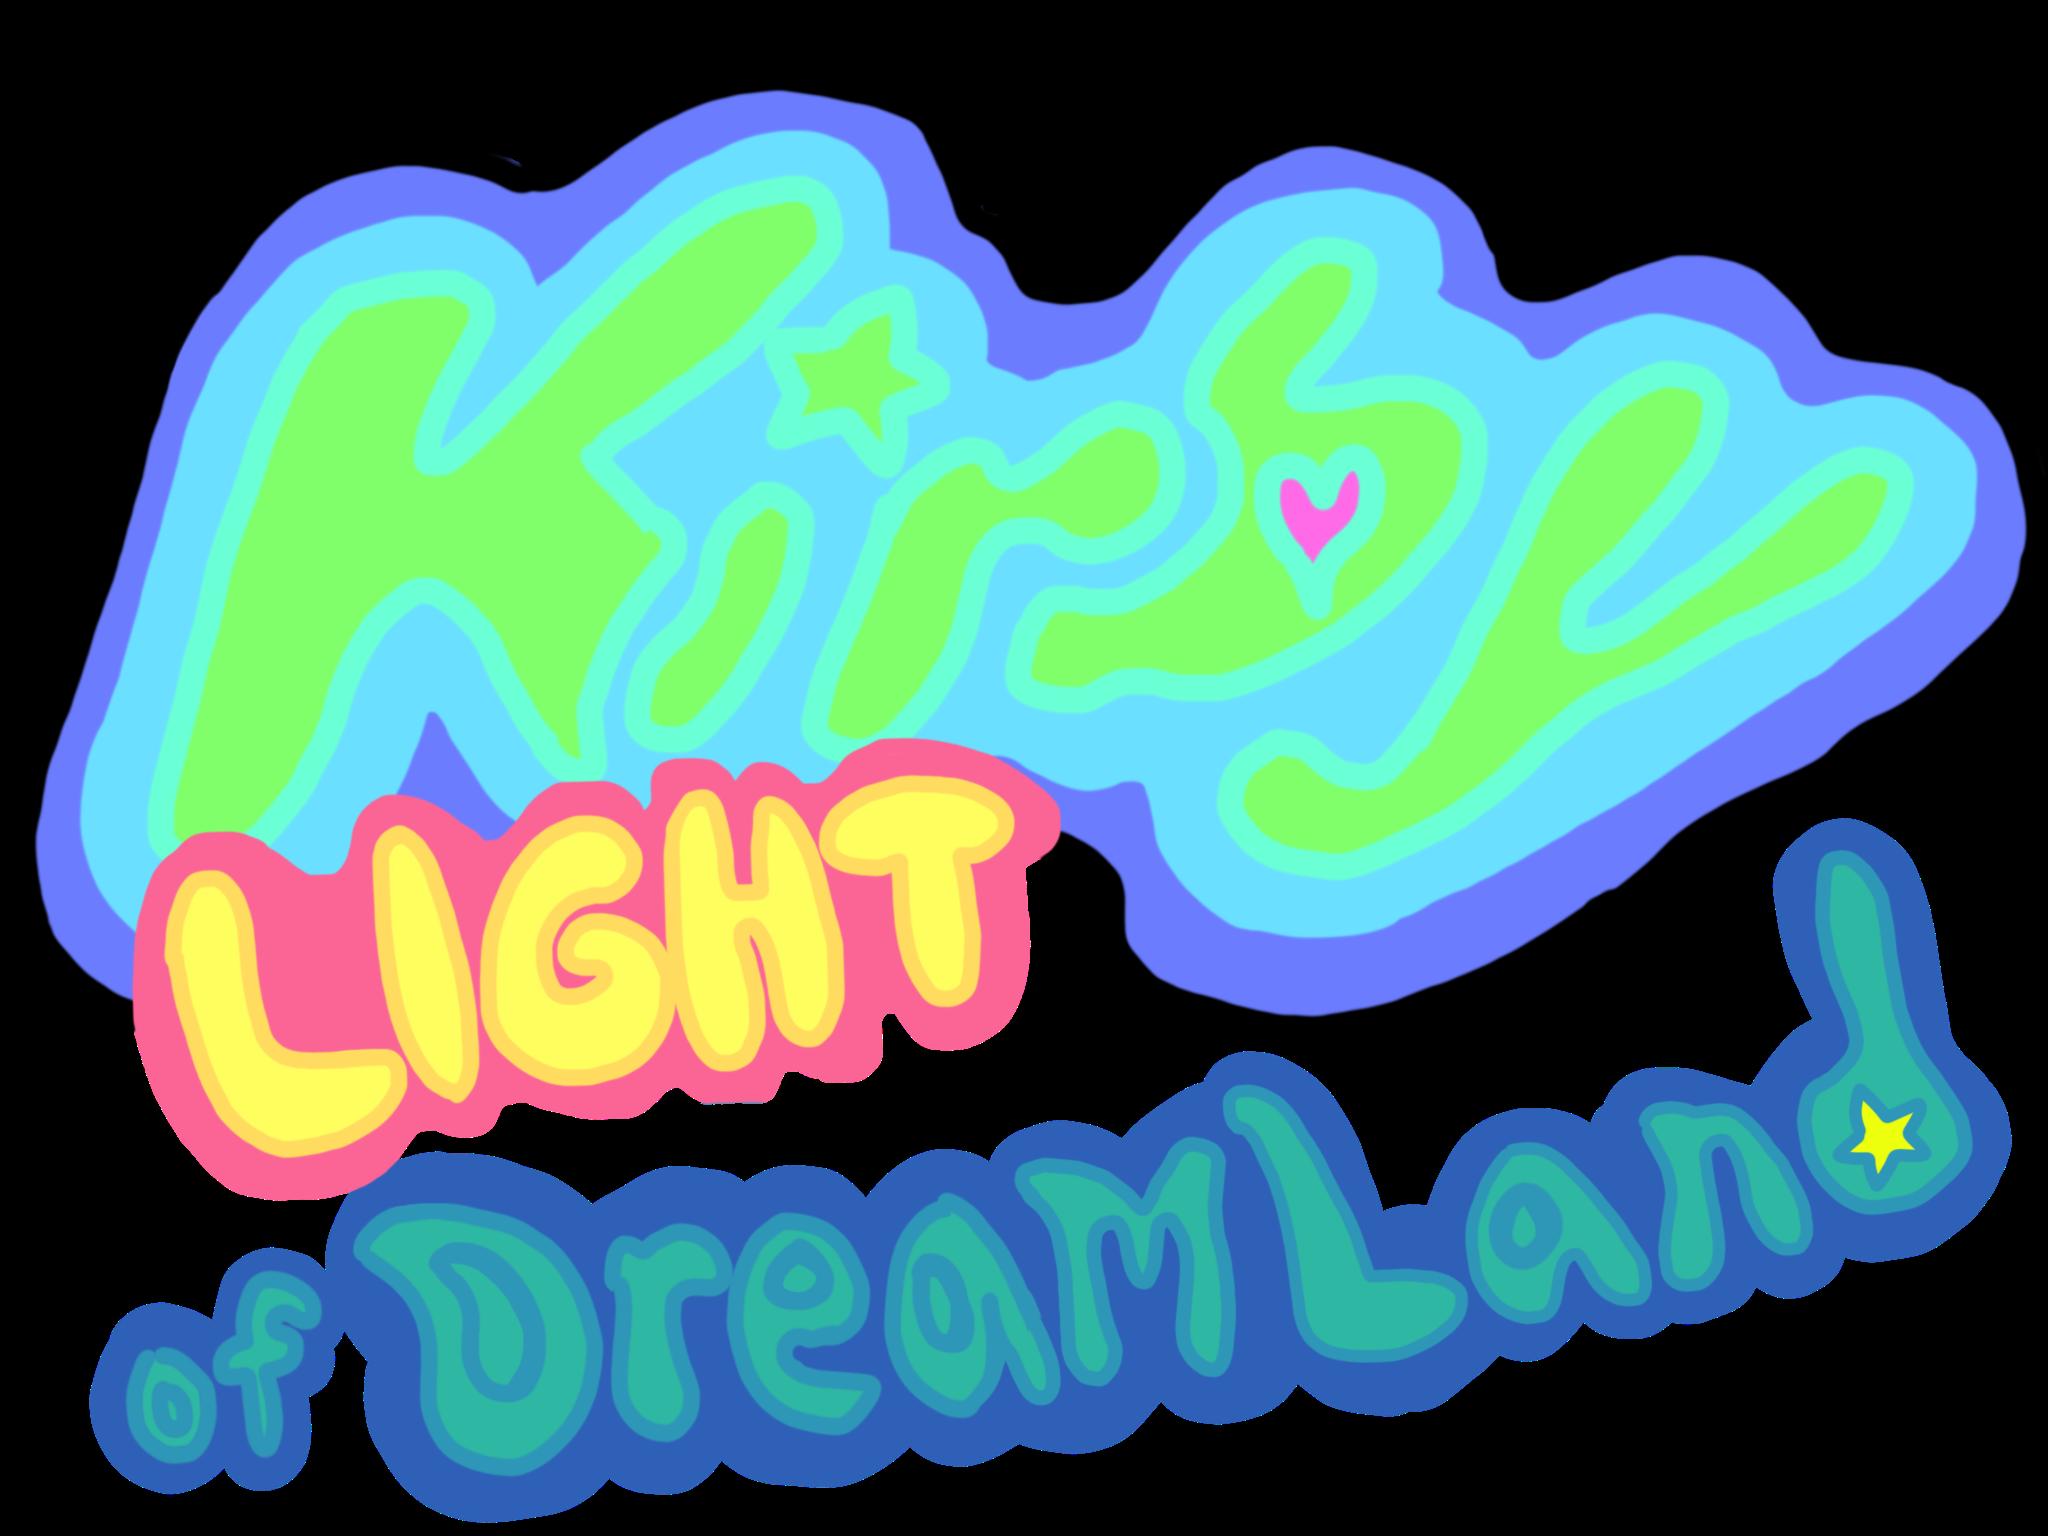 Kirby: Light of Dream Land